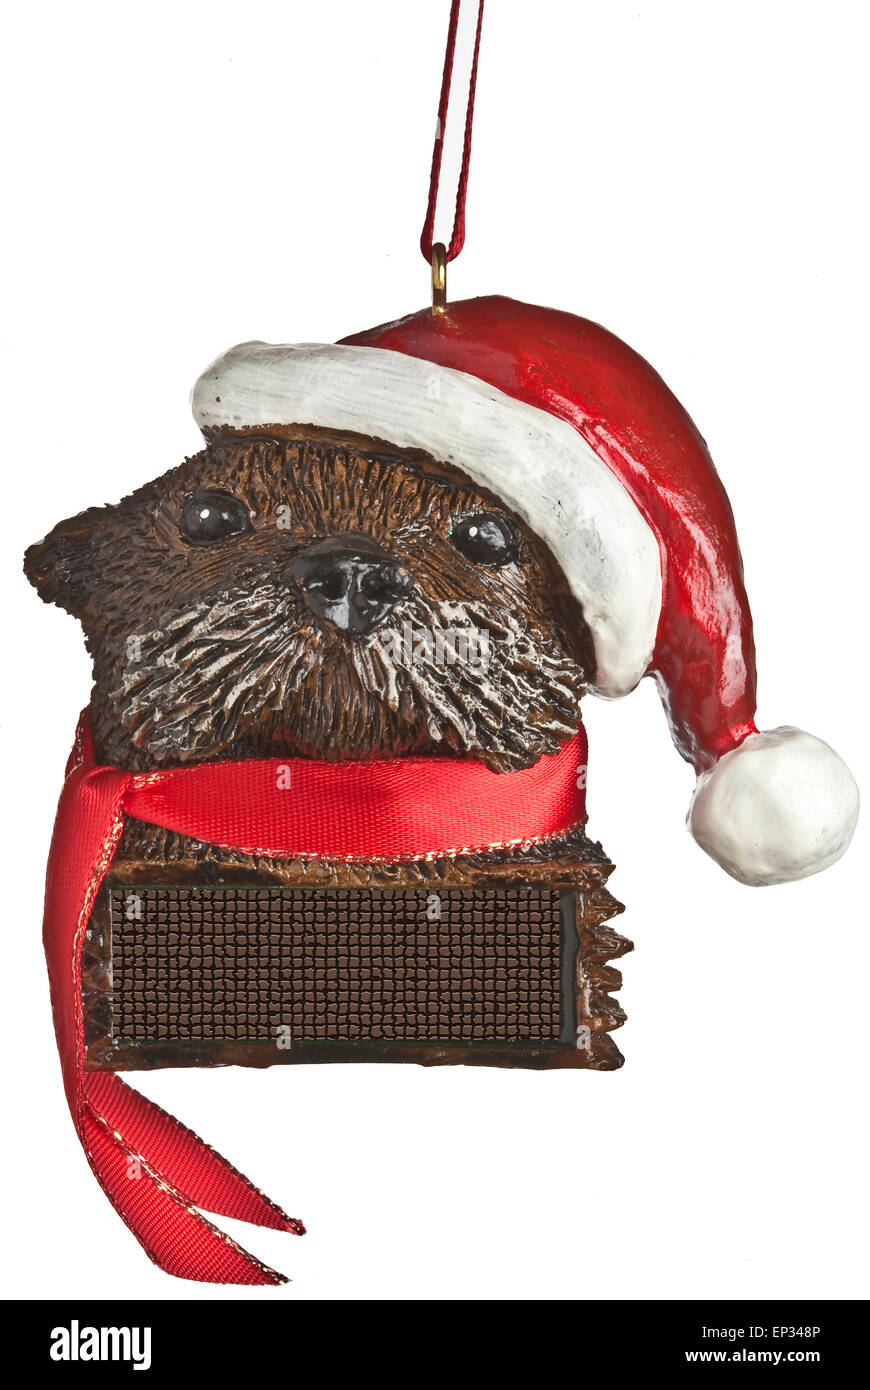 Sea otter in santa hat christmas ornament Stock Photo: 82433142 - Alamy